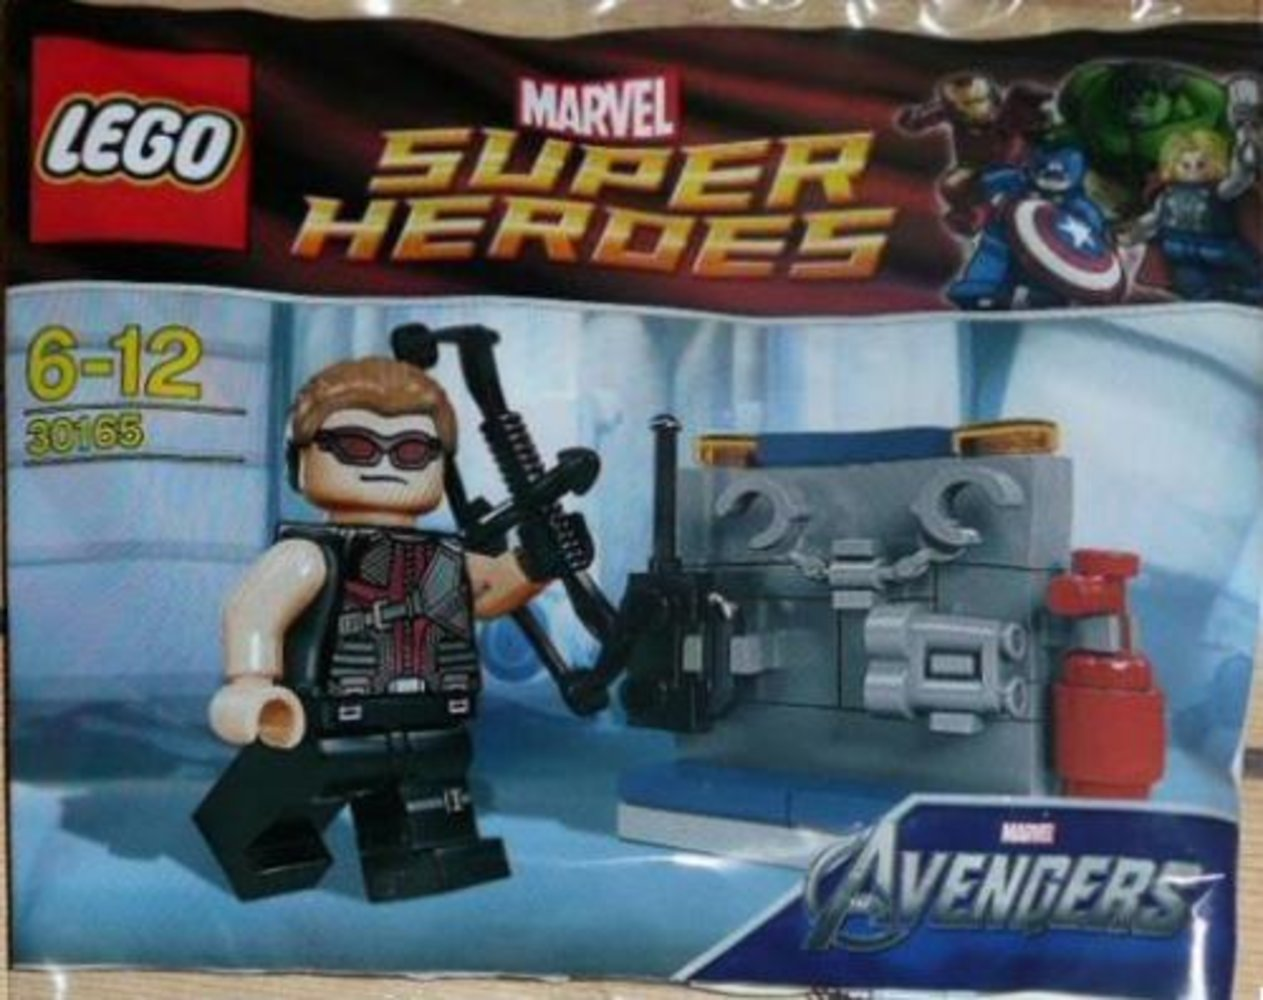 Hawkeye with Equipment